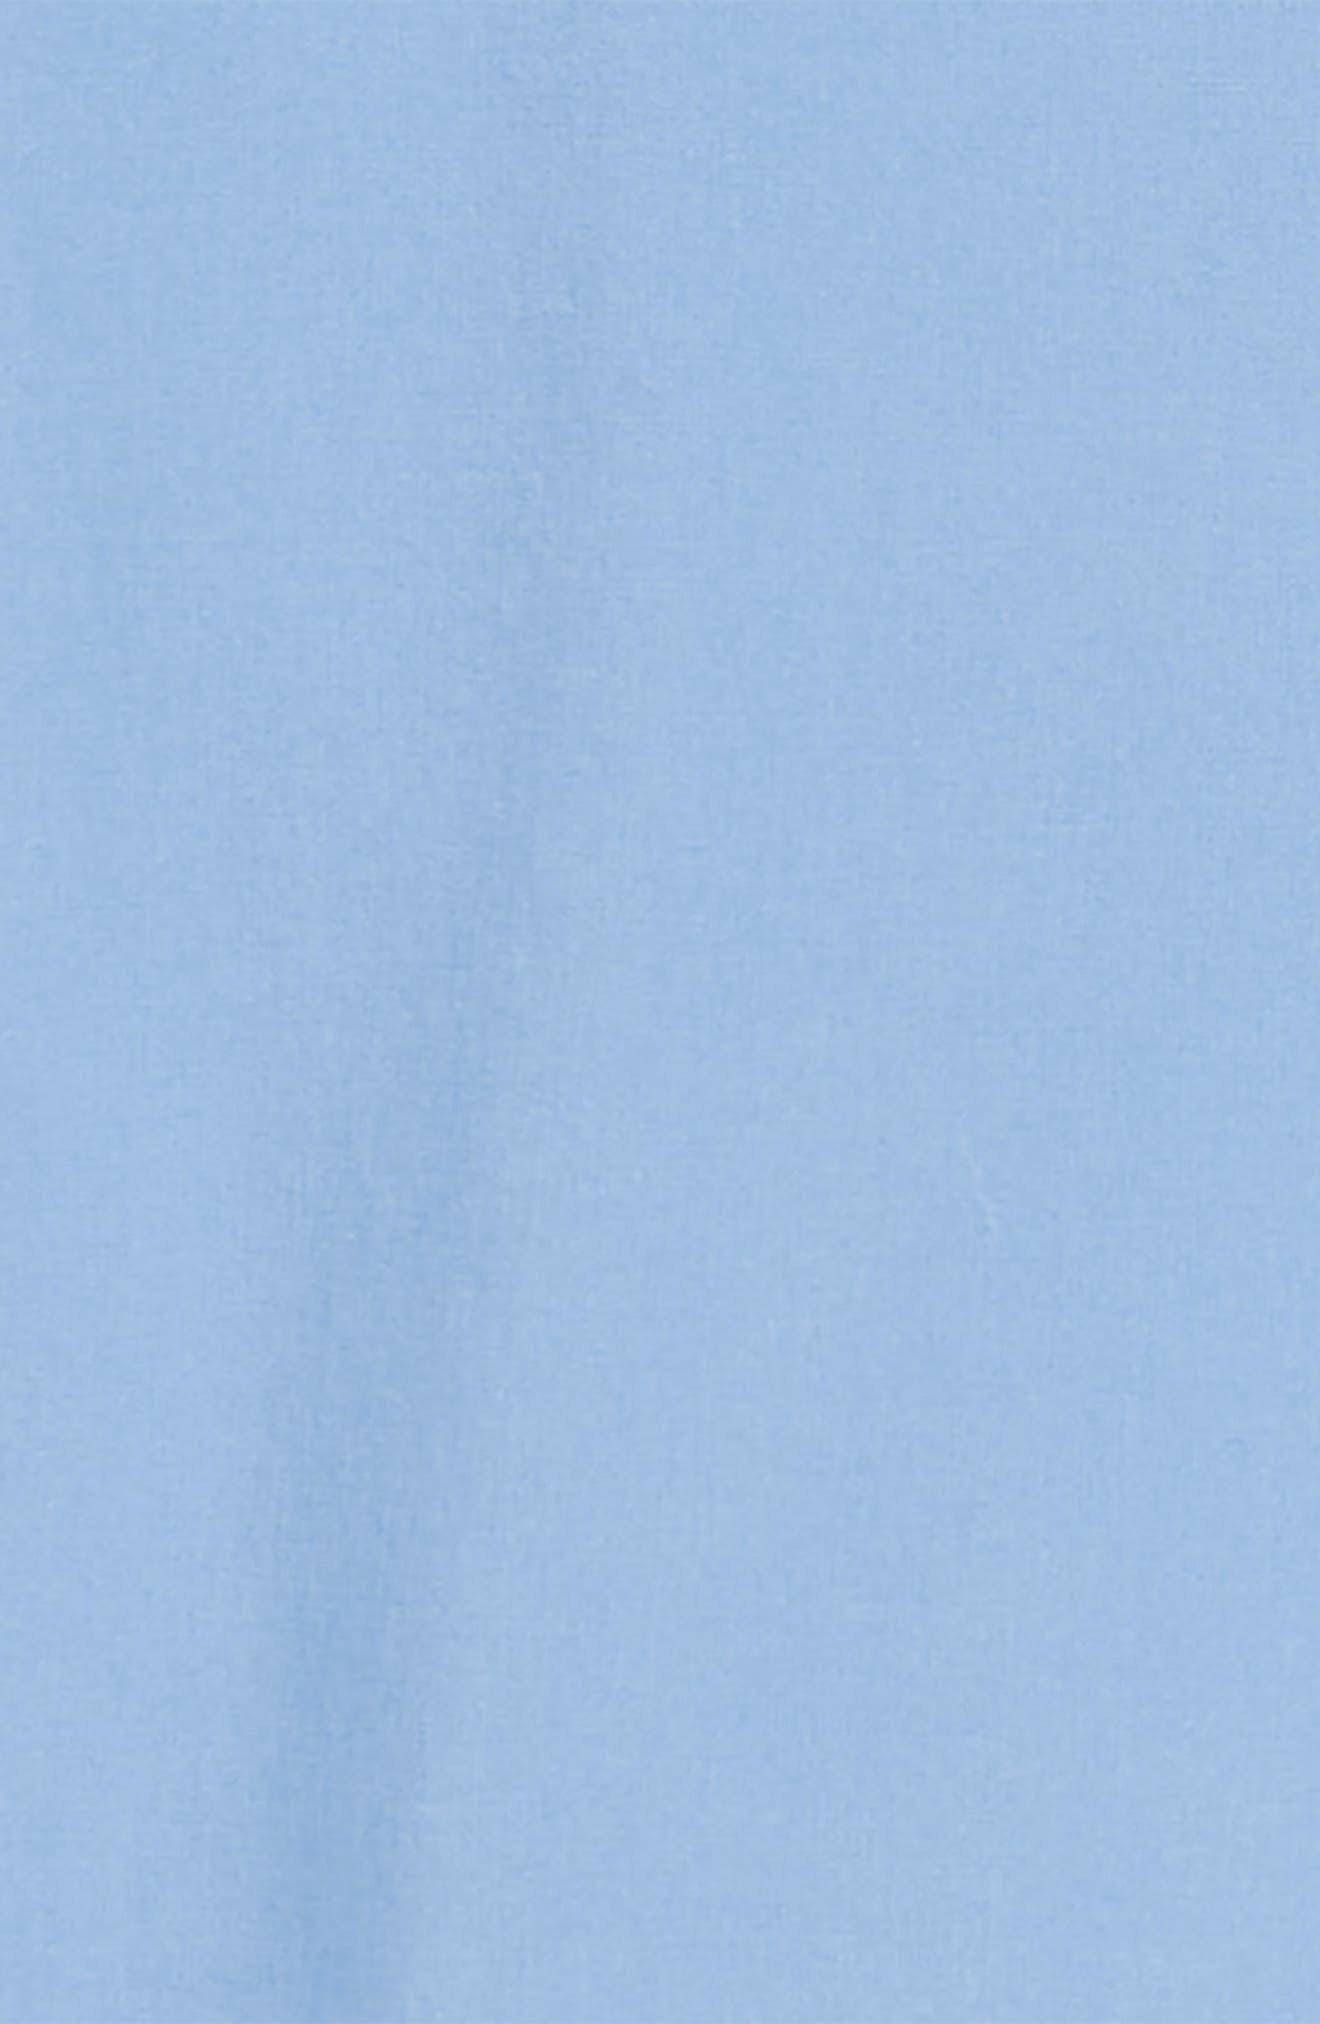 Performance Breaker Shorts,                             Alternate thumbnail 2, color,                             OCEAN BREEZE